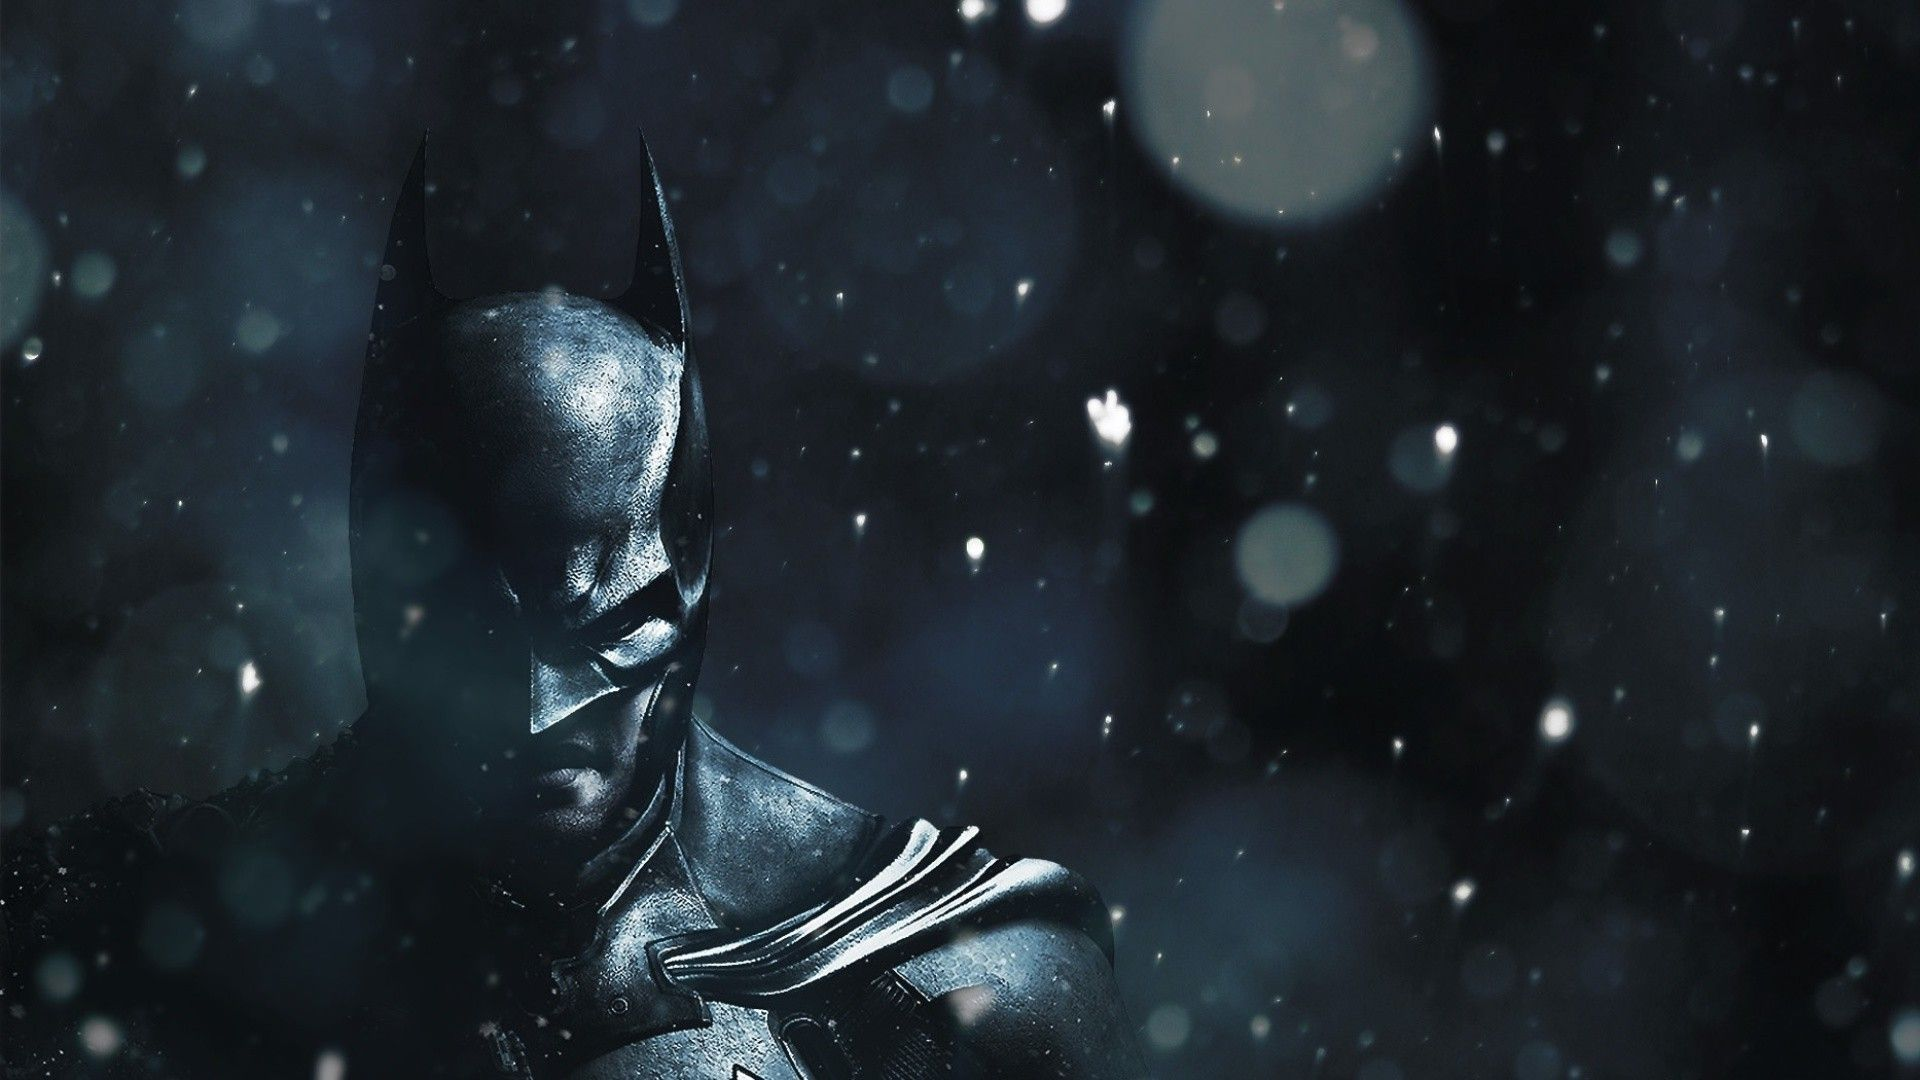 Batman HD Wallpaper For Desktop 1920x1080